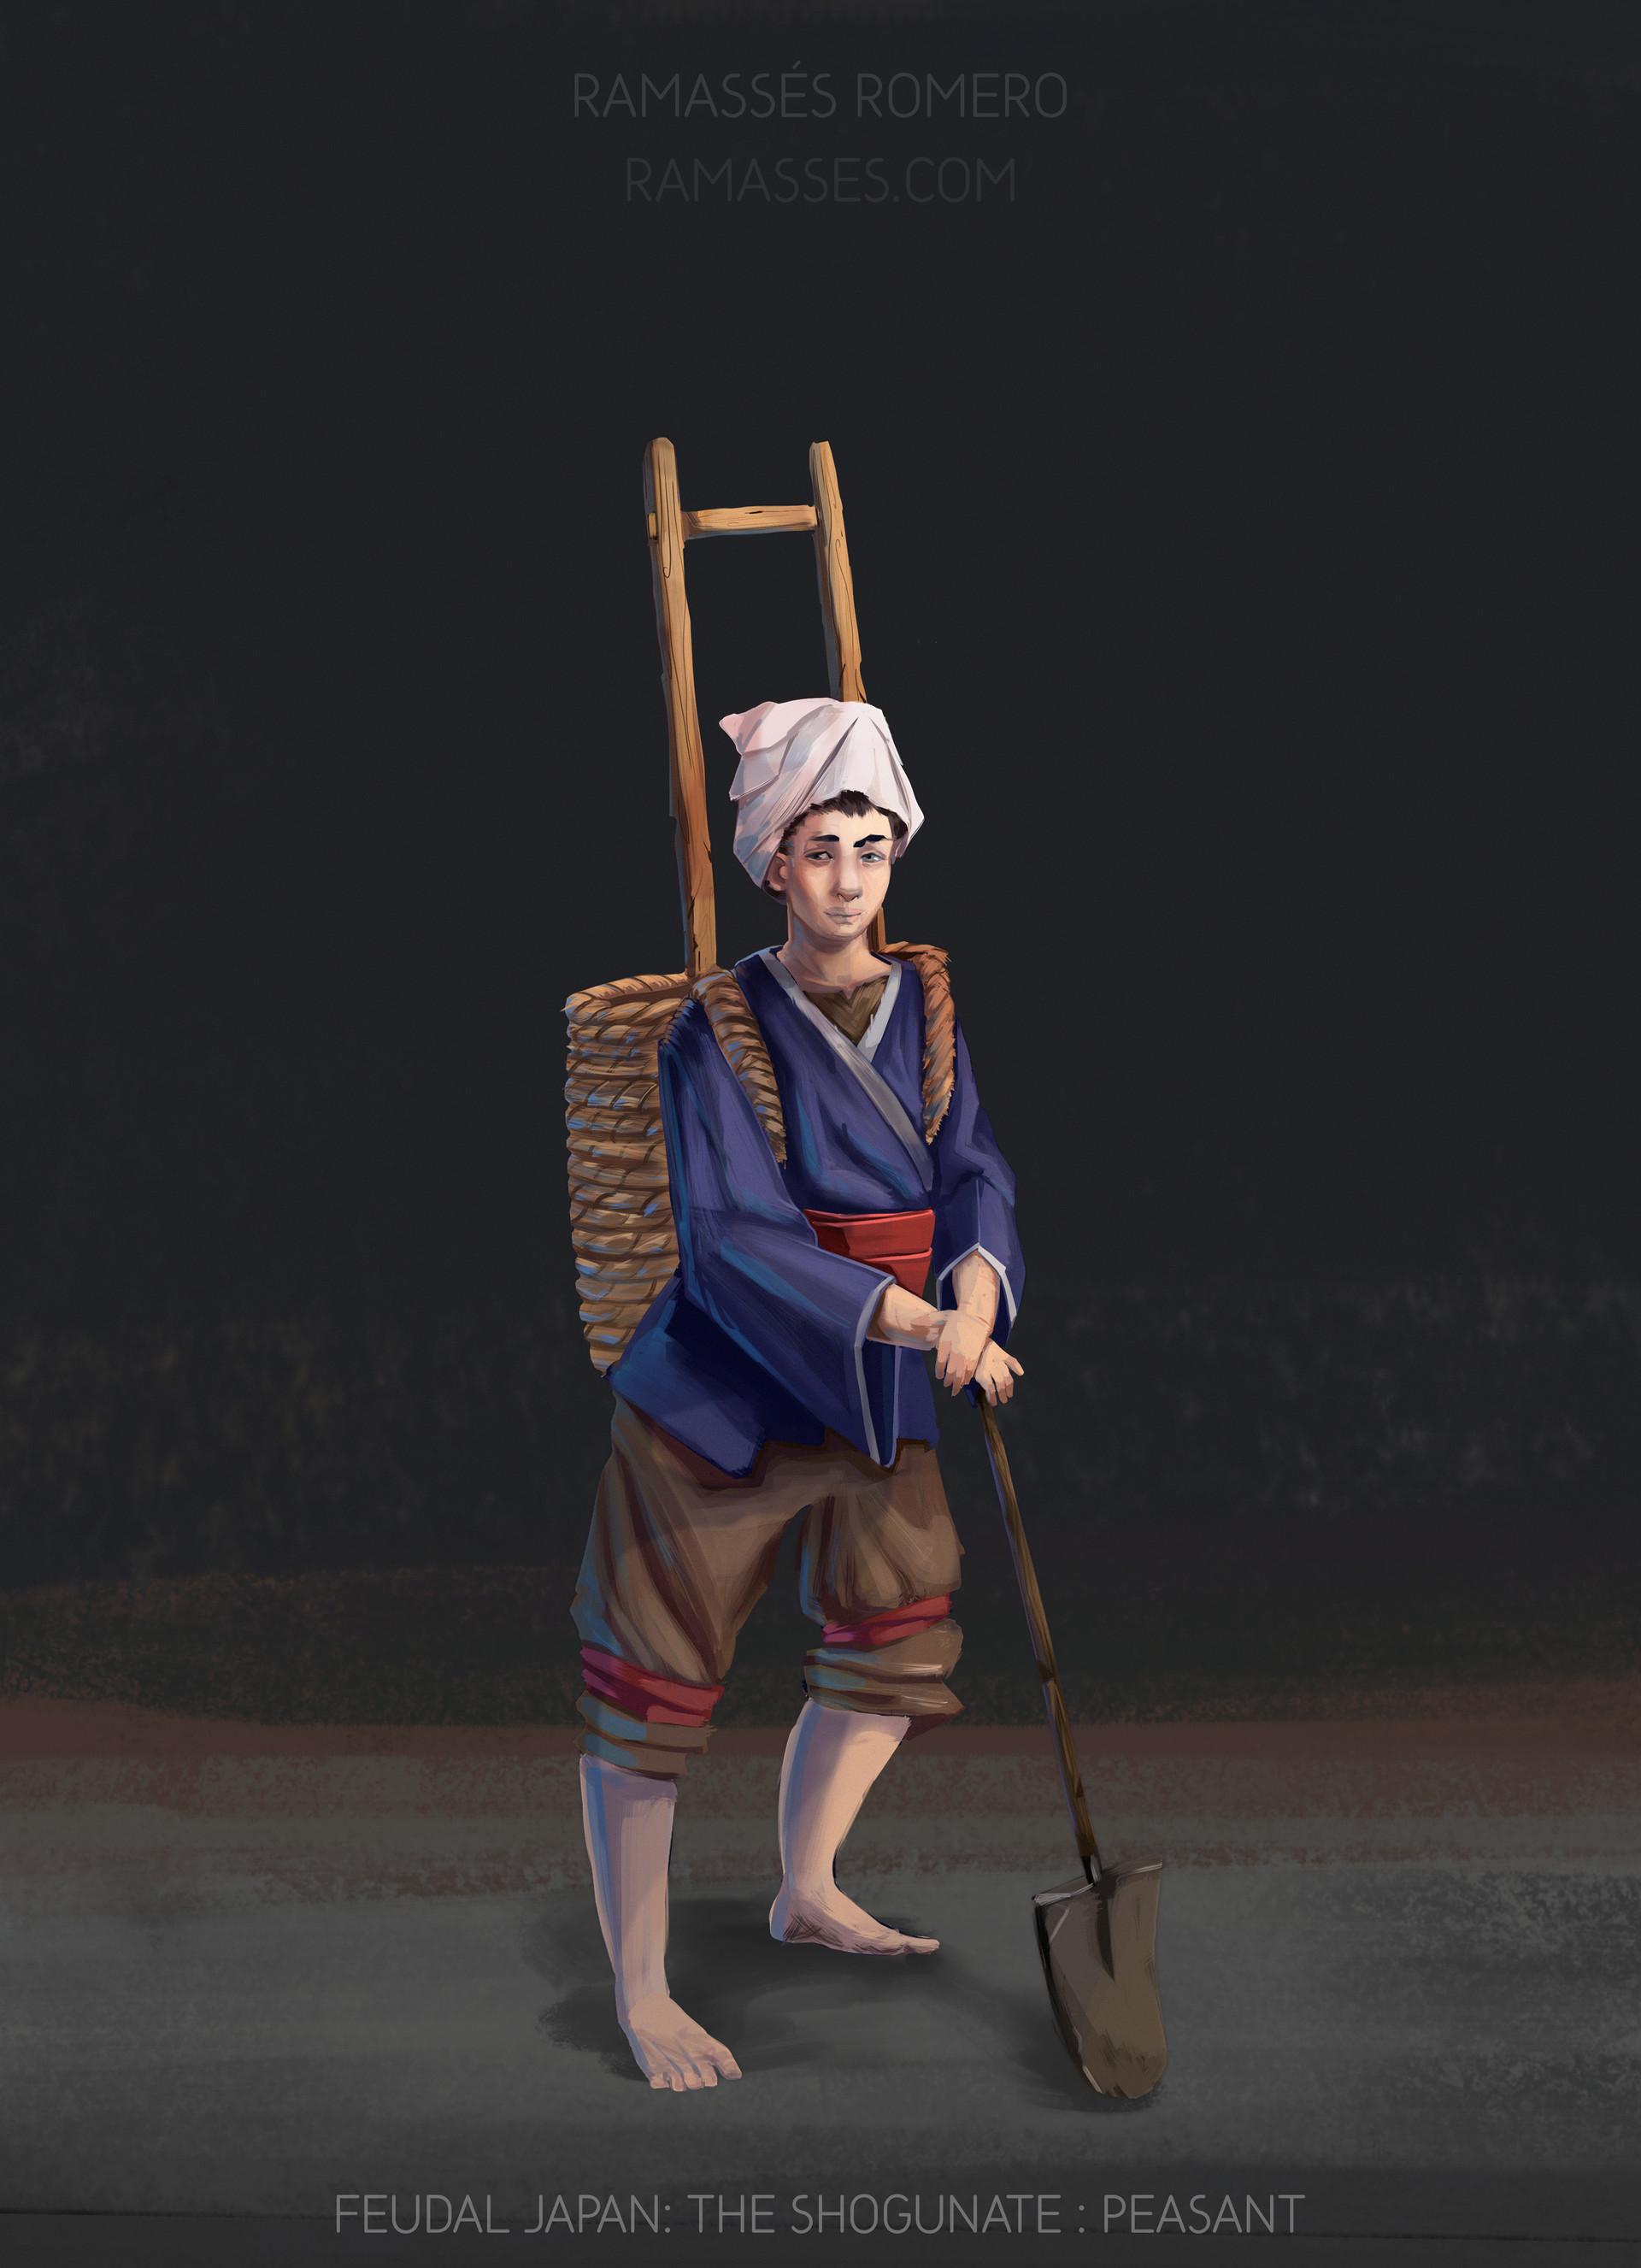 Ramasses romero shogunateexport peasant